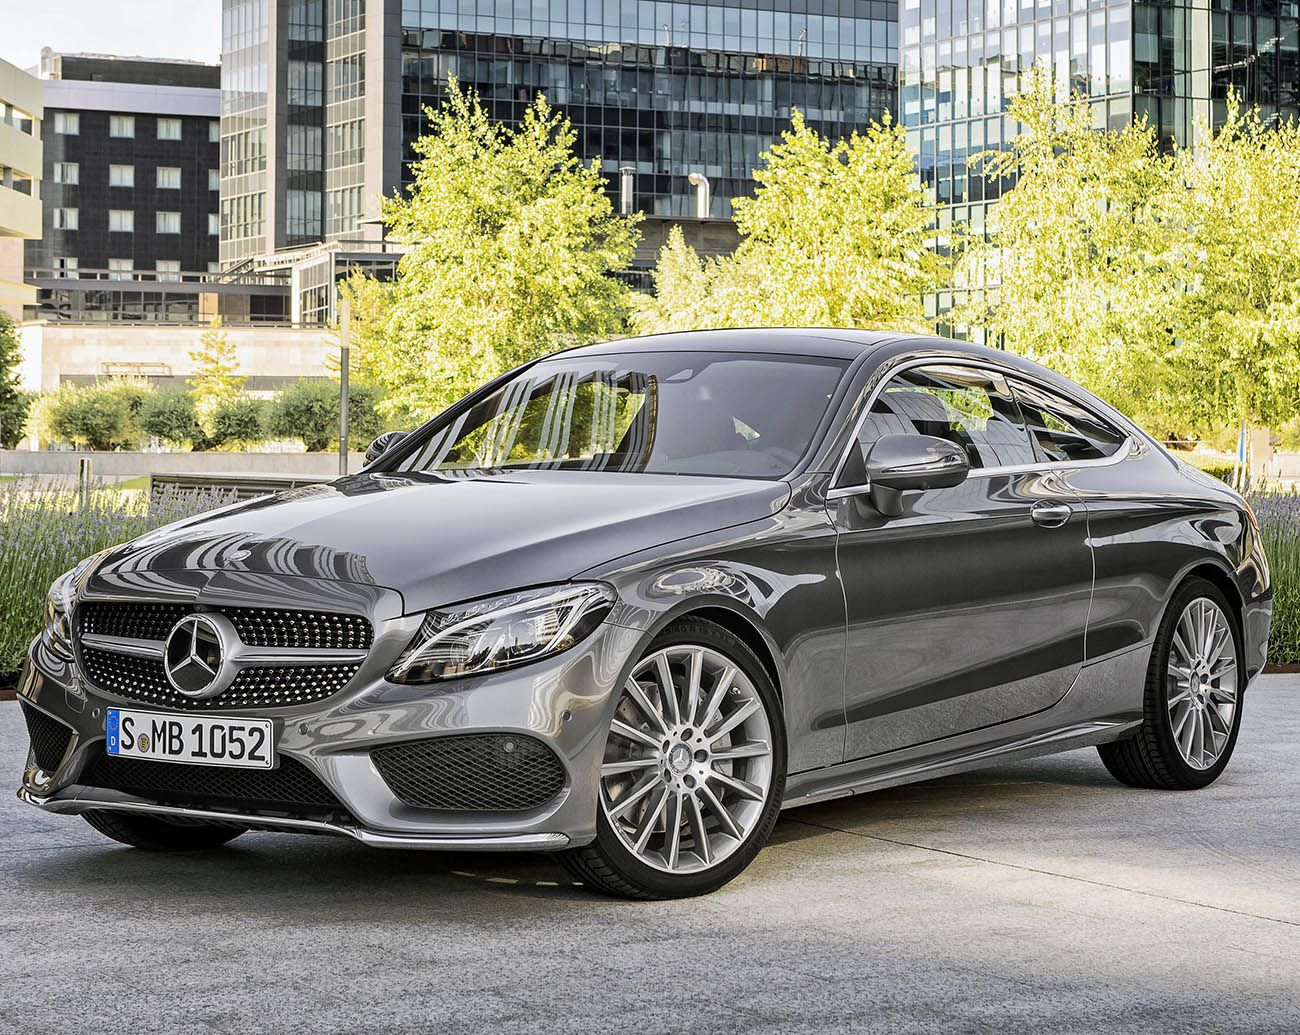 مرسيدس بنز سي كلاس كوبيه 2017 جمال وتصميم يأسر القلوب موقع ويلز Mercedes Benz C300 Mercedes Coupe Mercedes C Class Coupe